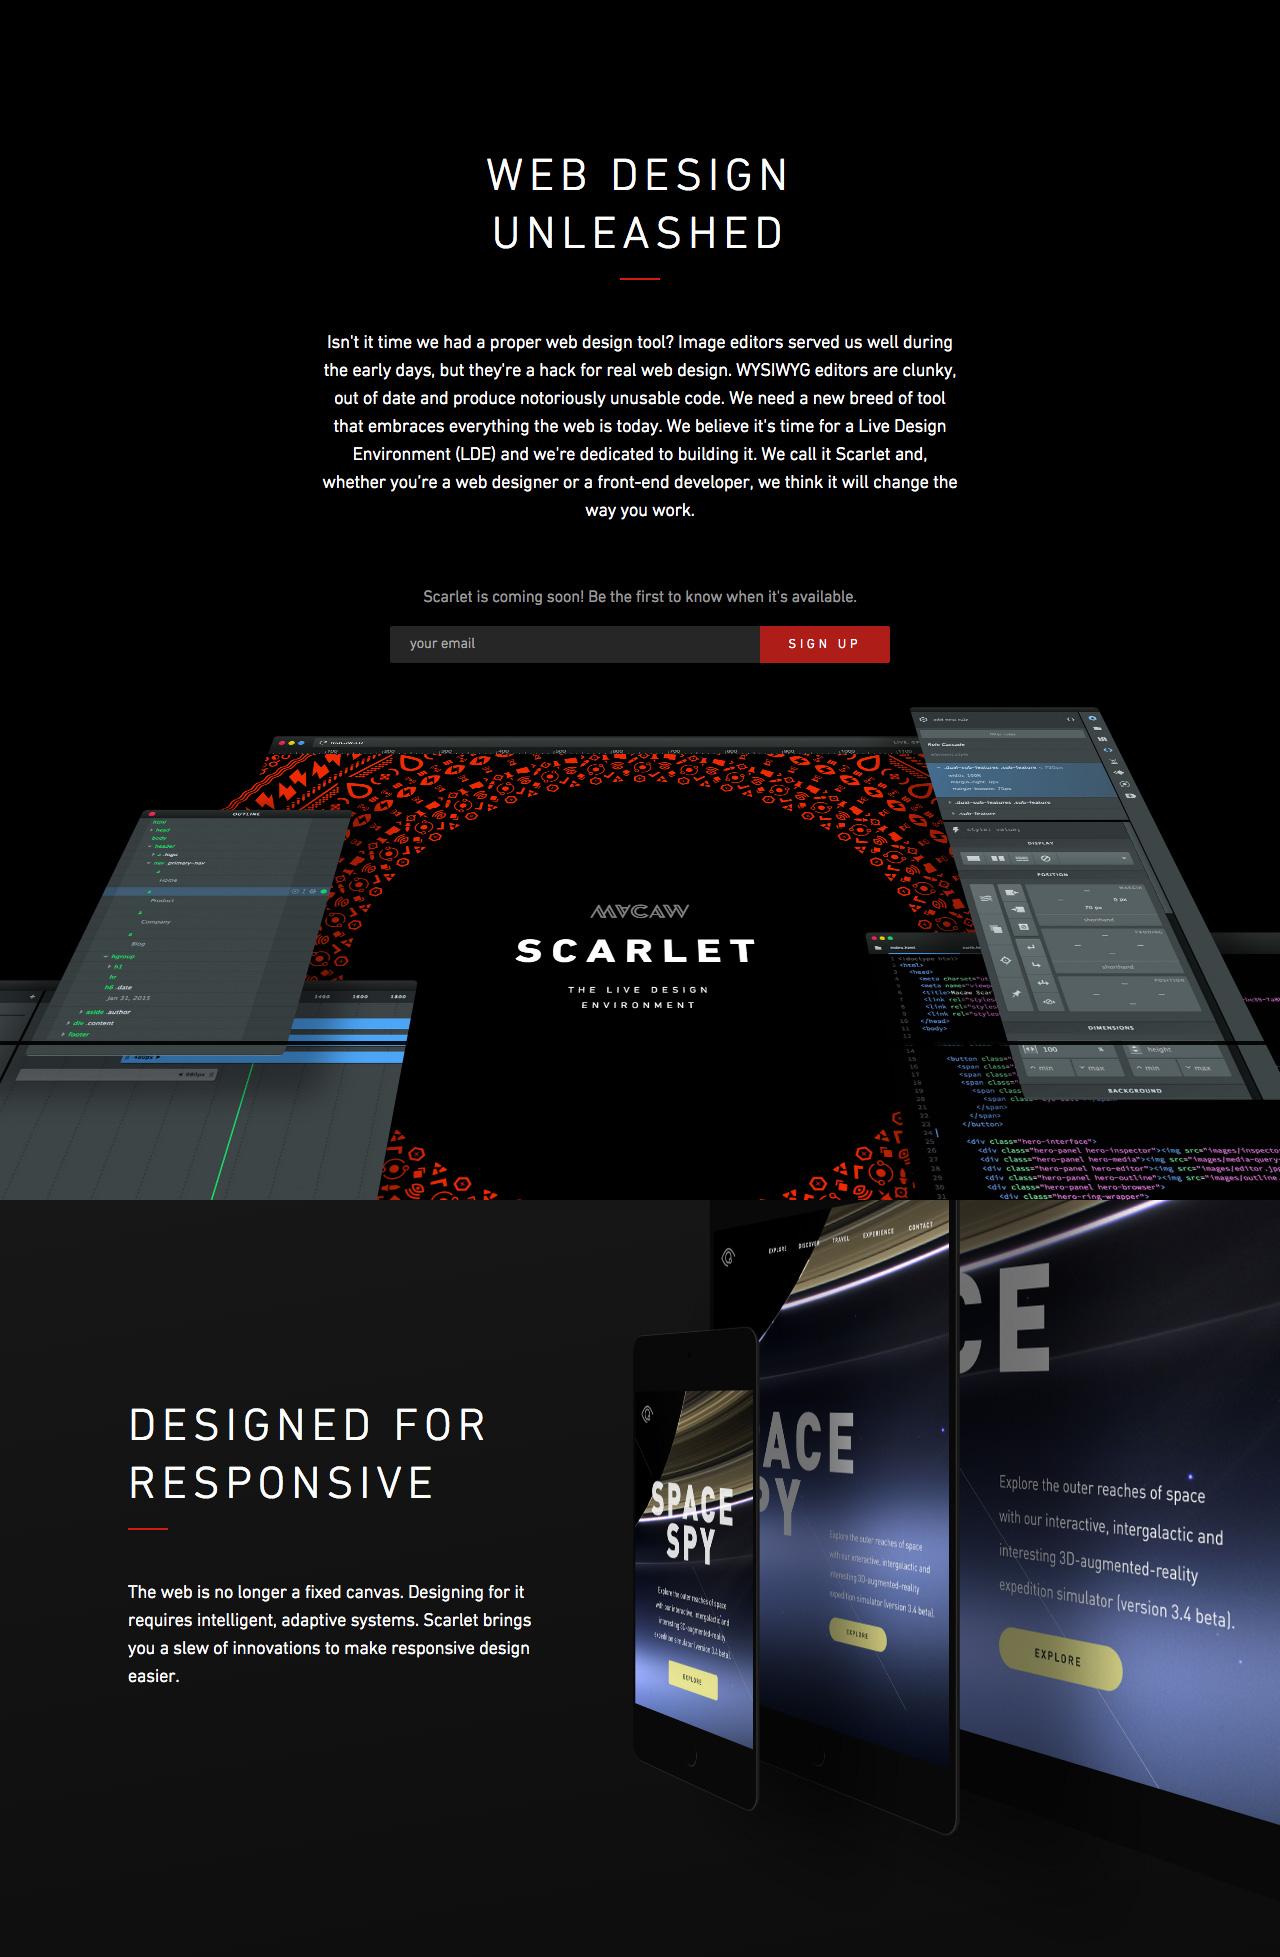 Macaw Scarlet Website Screenshot